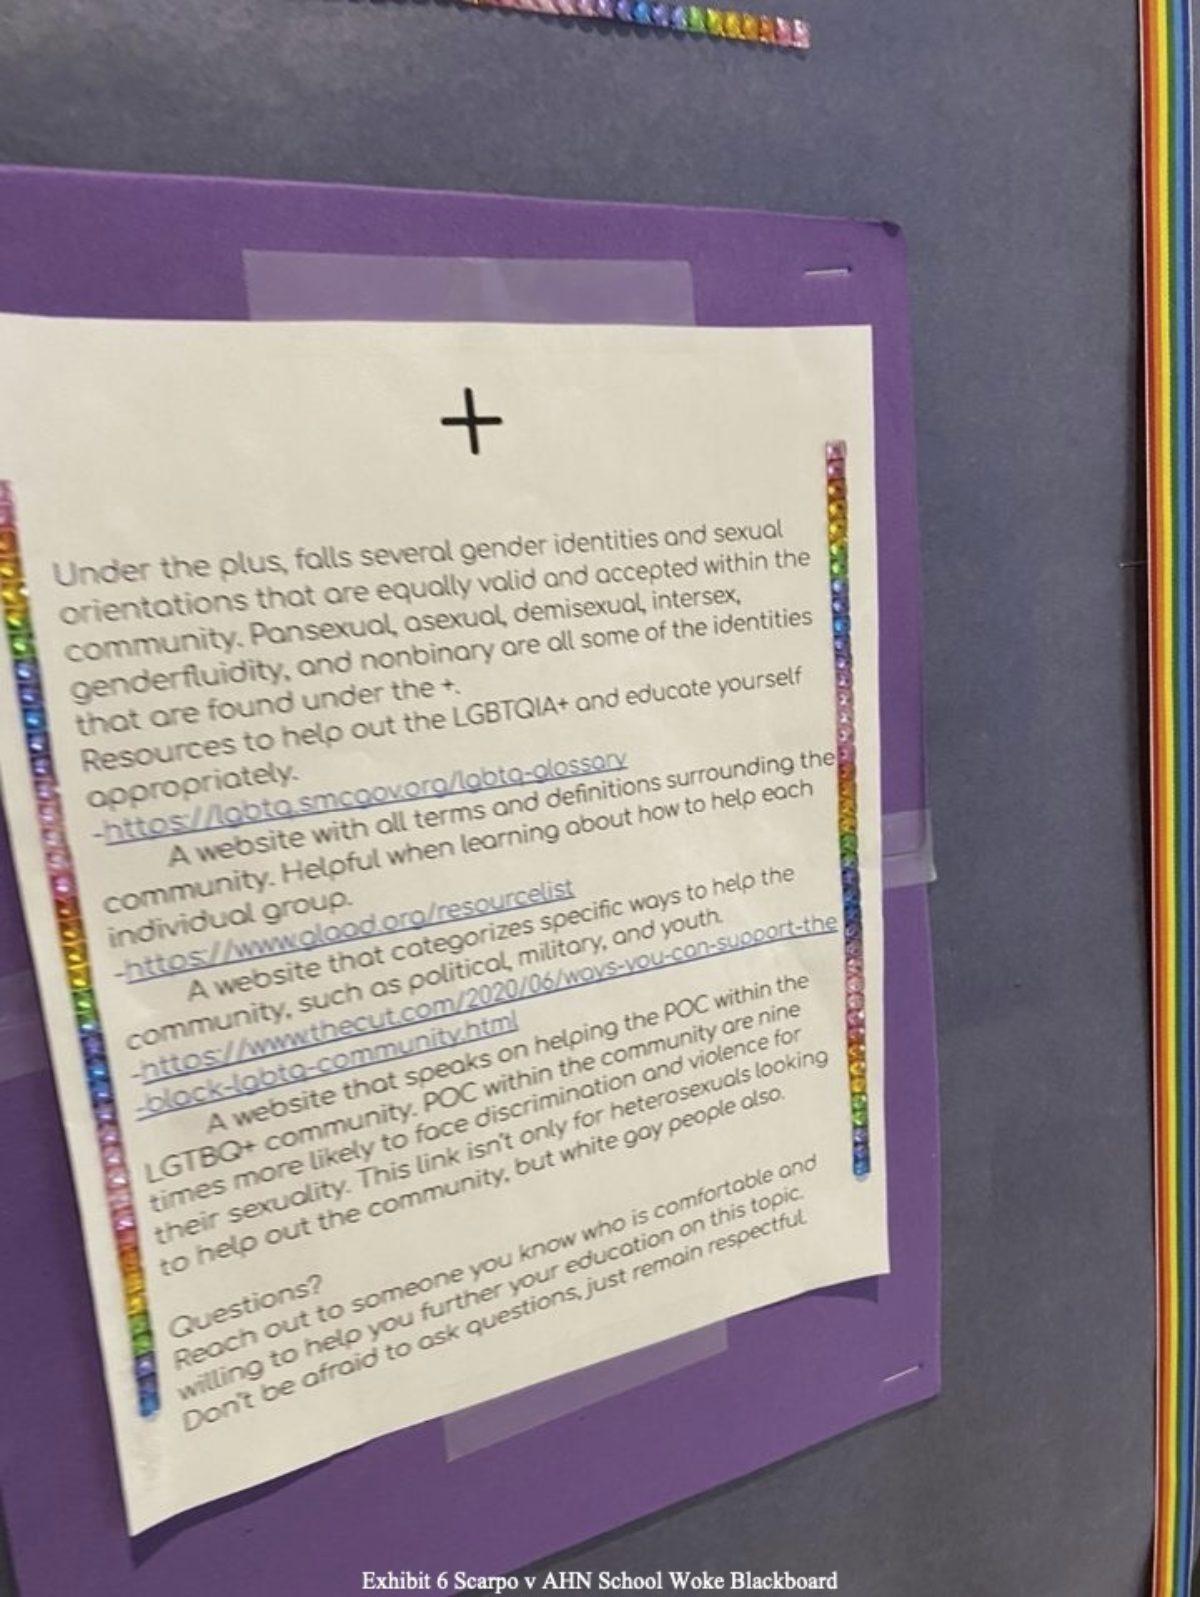 AHN LGBTQ+ Bulletin Board (+)